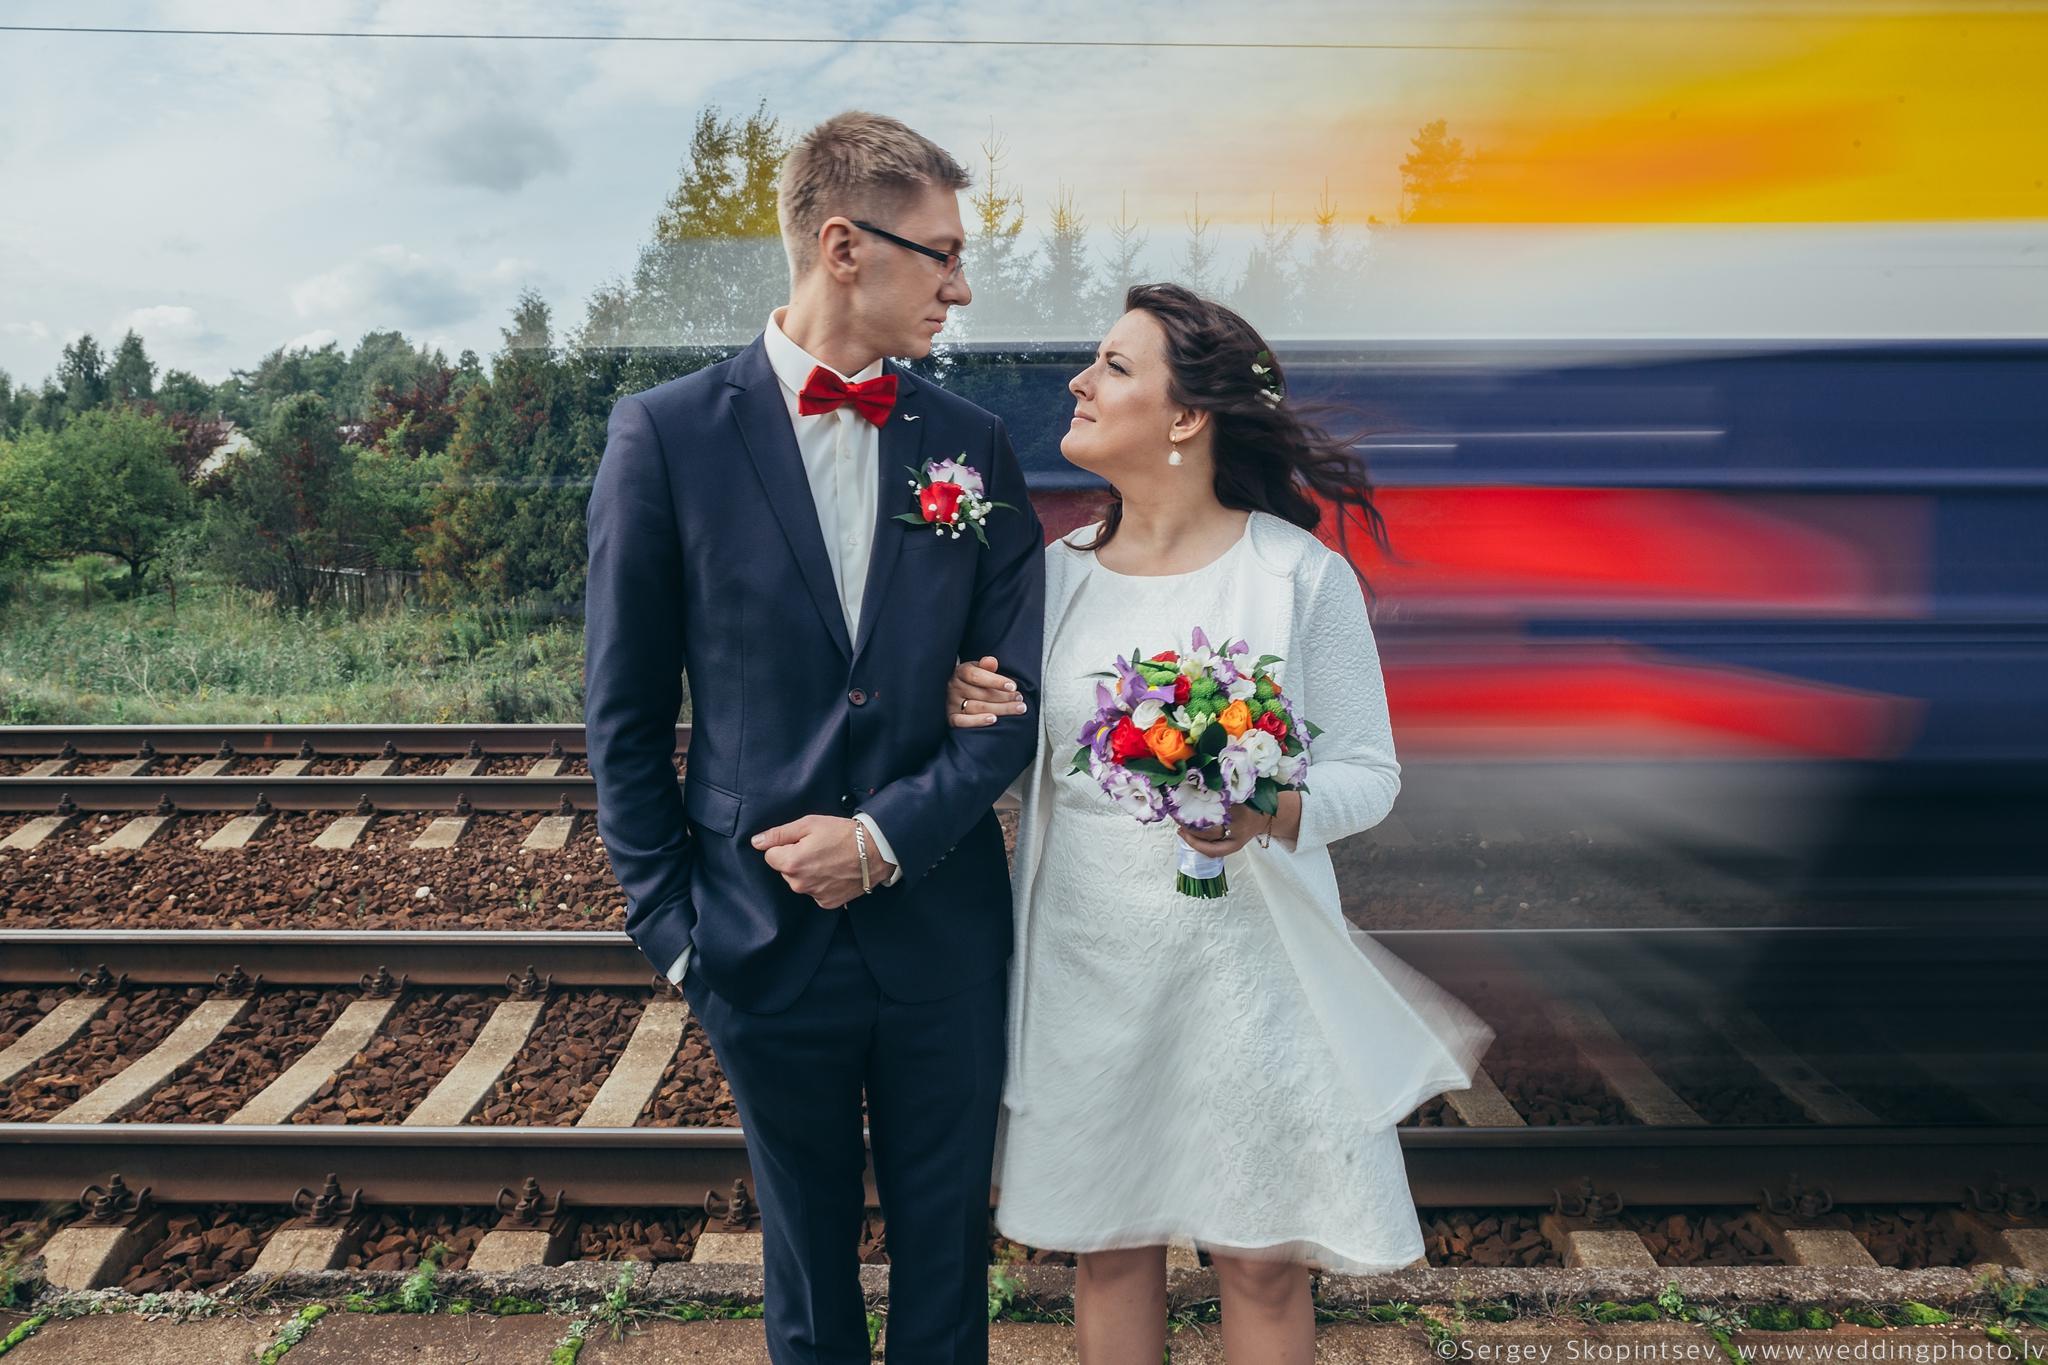 Edijs & Kintija | Jelgava